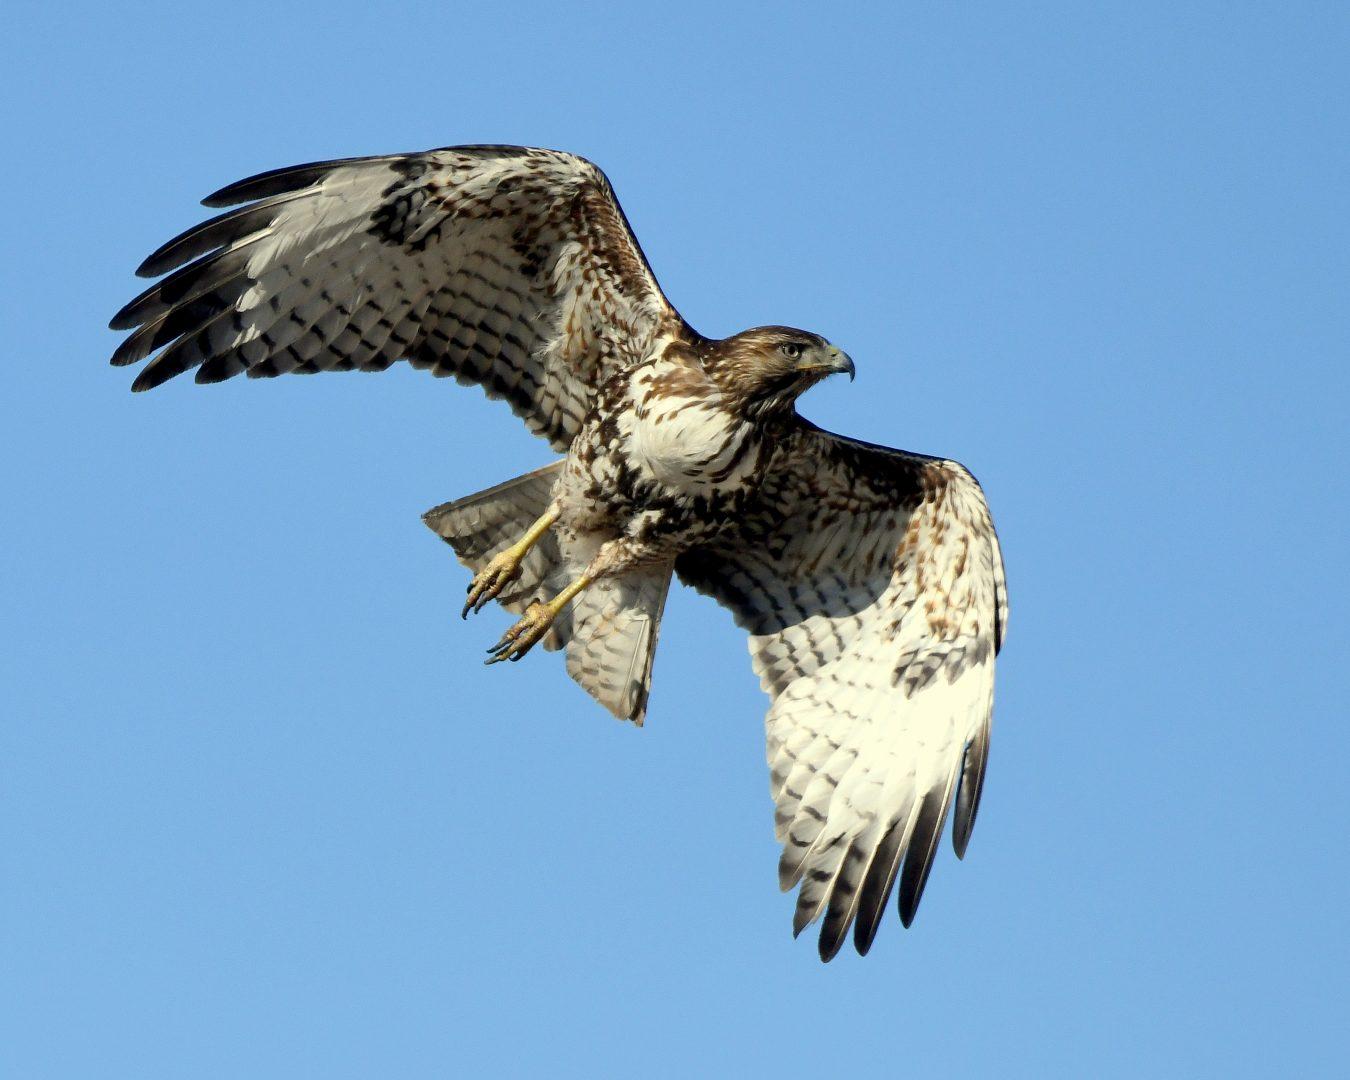 Red-tailed Hawk | Estancia, N.M. | March, 2021